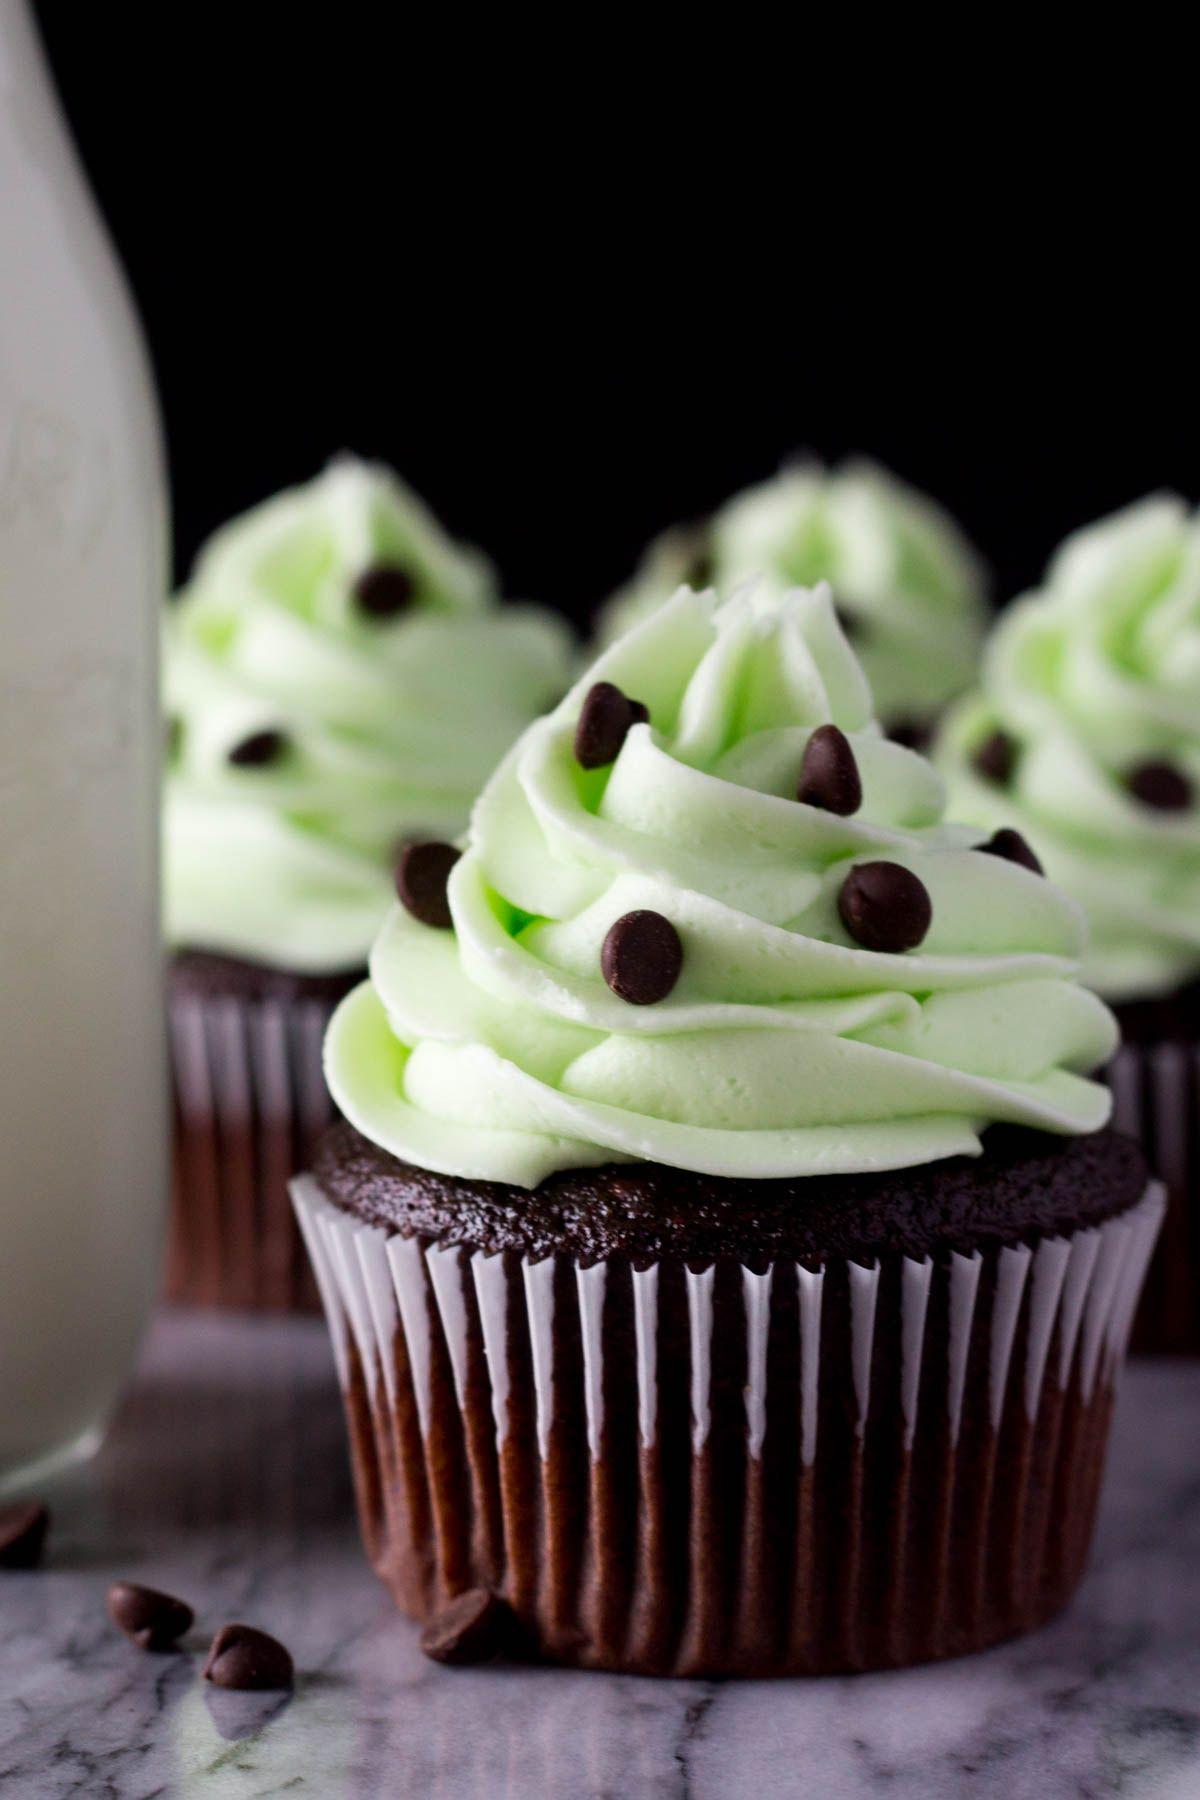 mint chocolate cupcakes recipe cupcake recipes mint chocolate creative cupcake recipes mint chocolate cupcakes